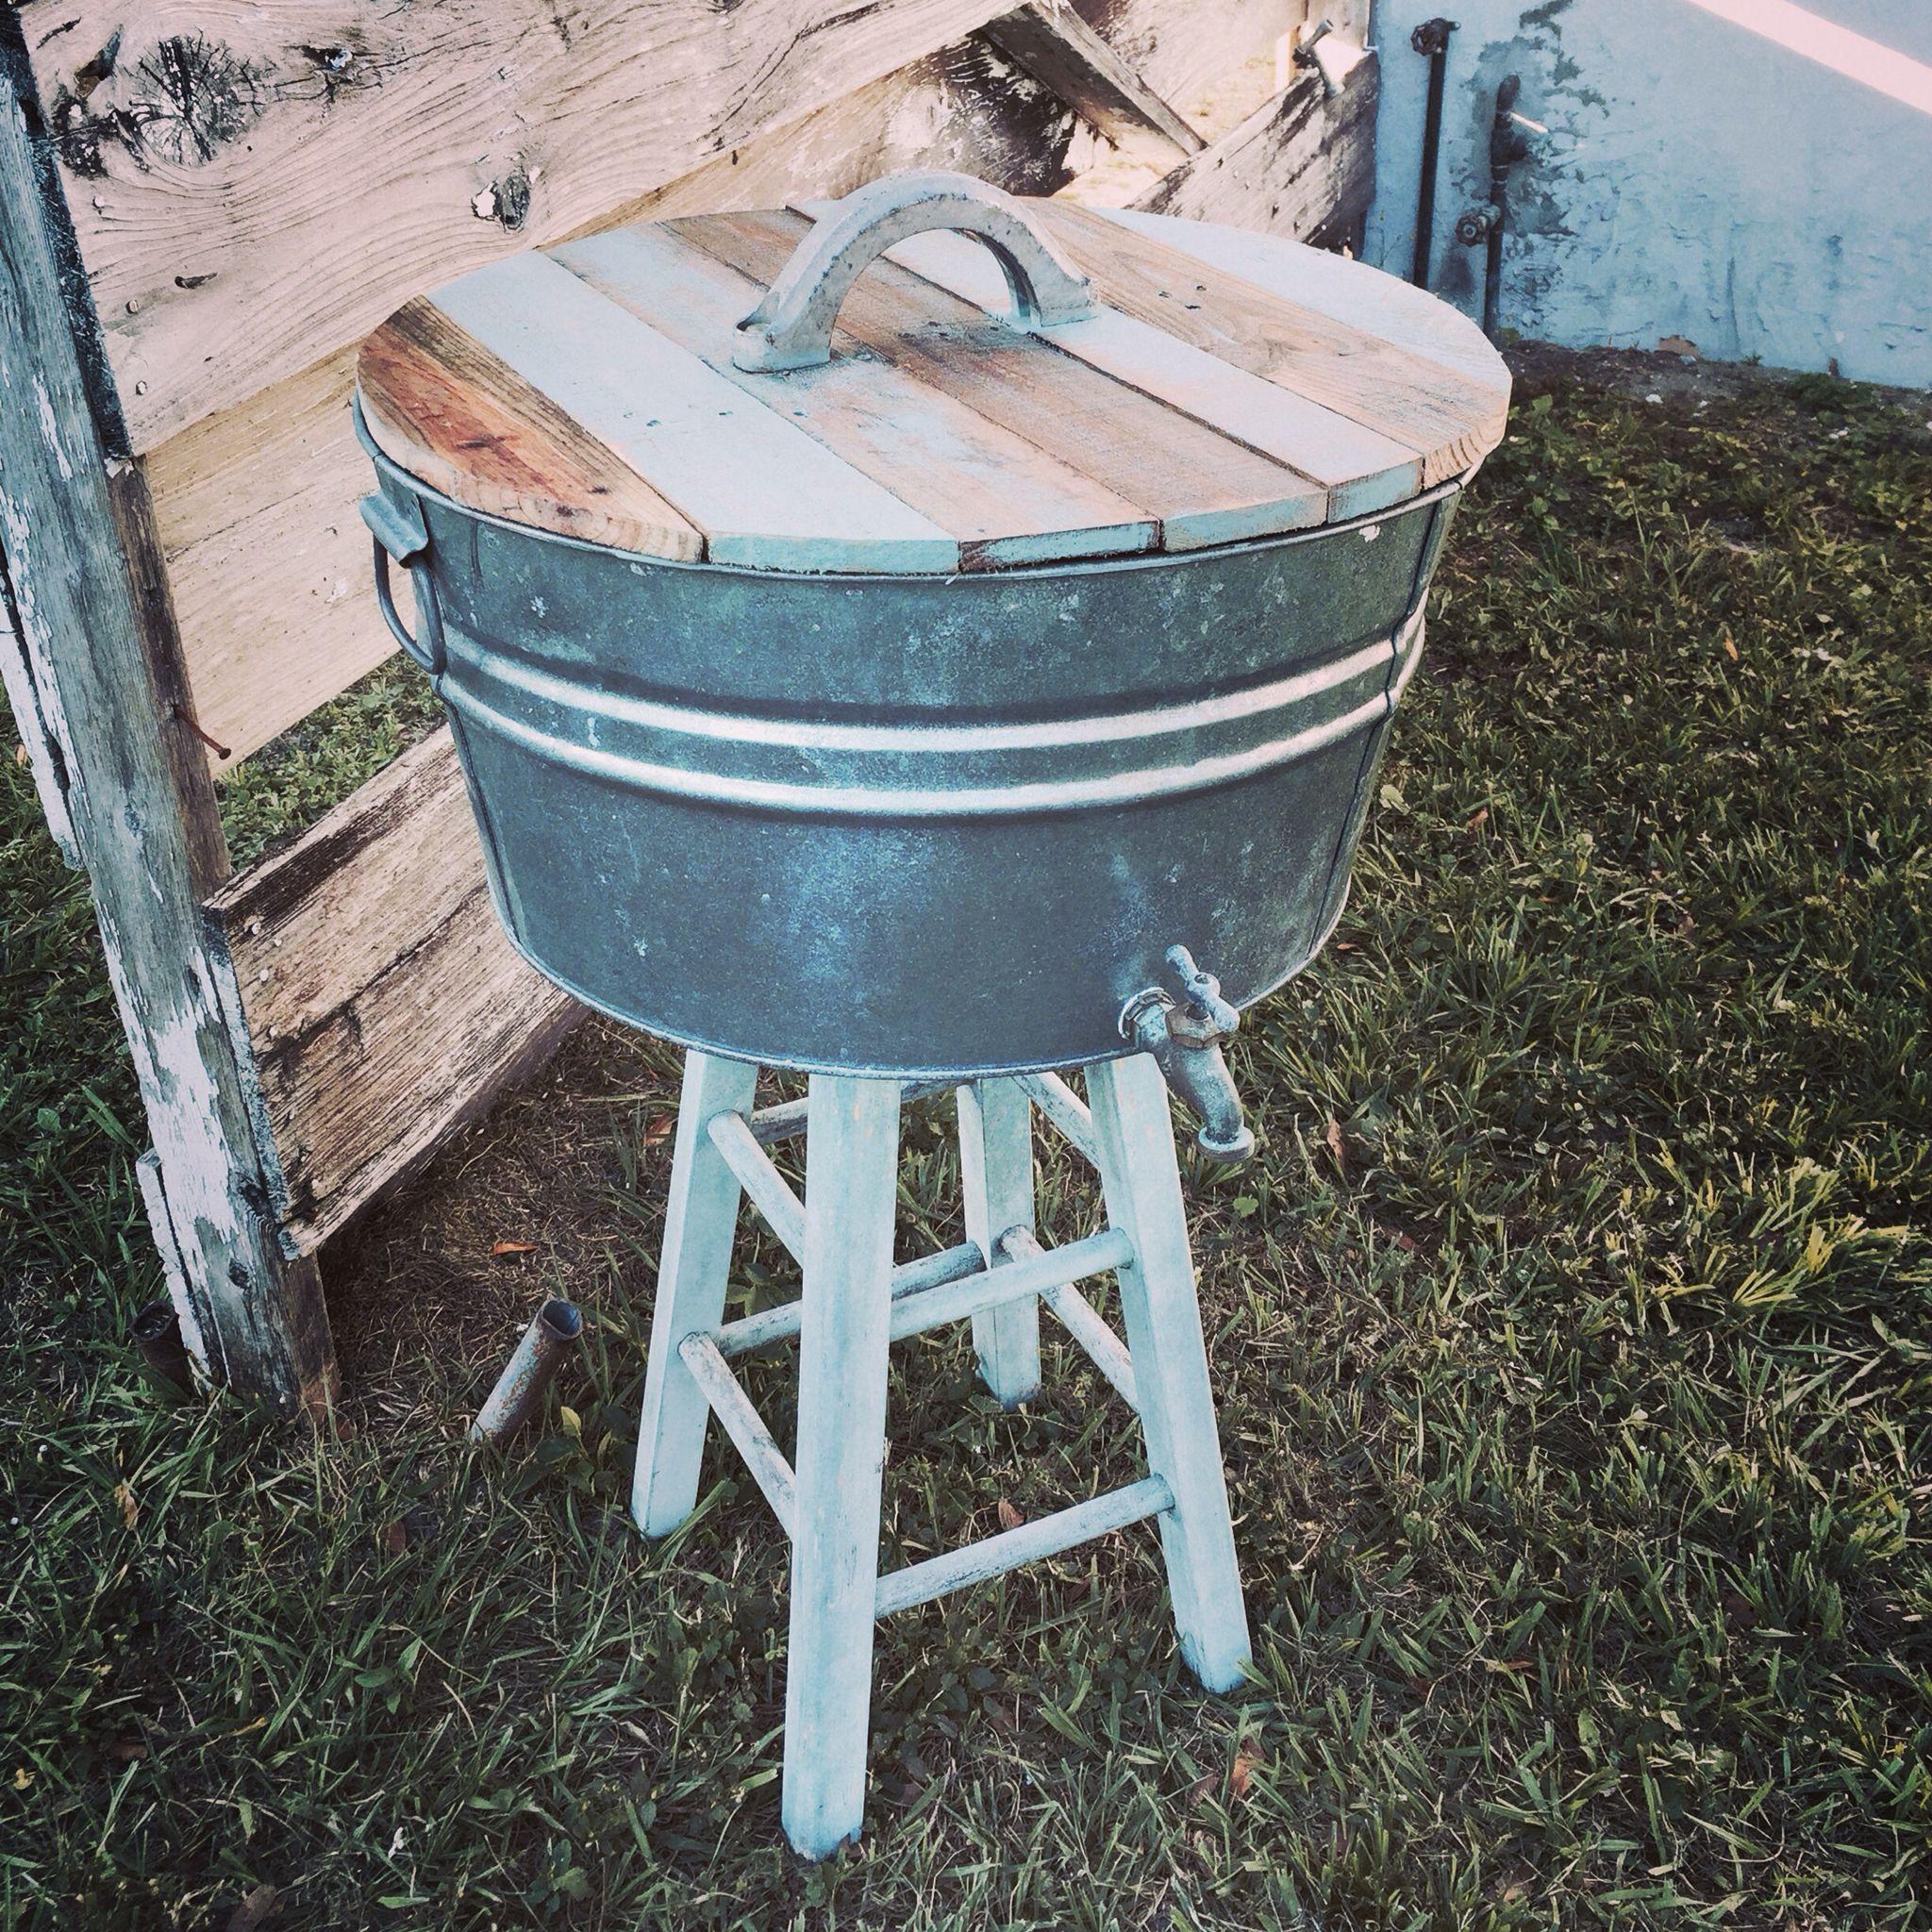 Galvanized tub into backyard ice bucket with images